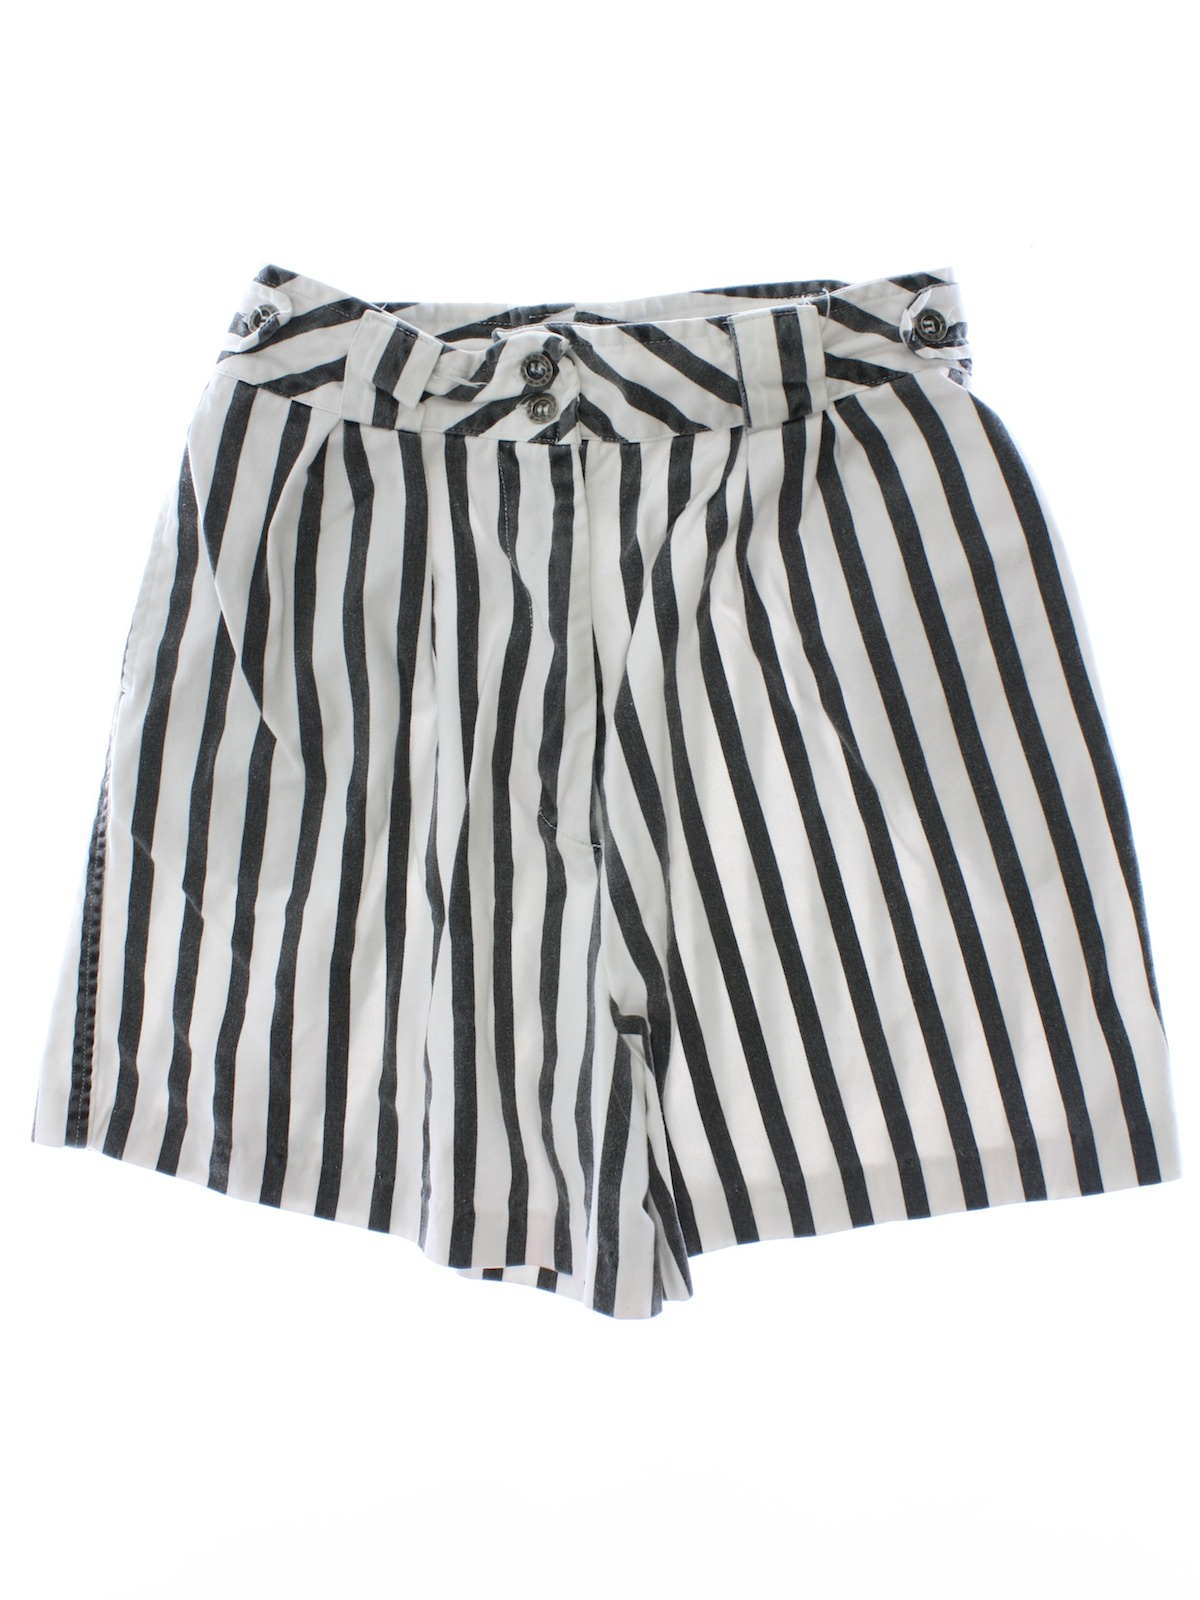 Black And White Striped Shorts Womens - Hardon Clothes